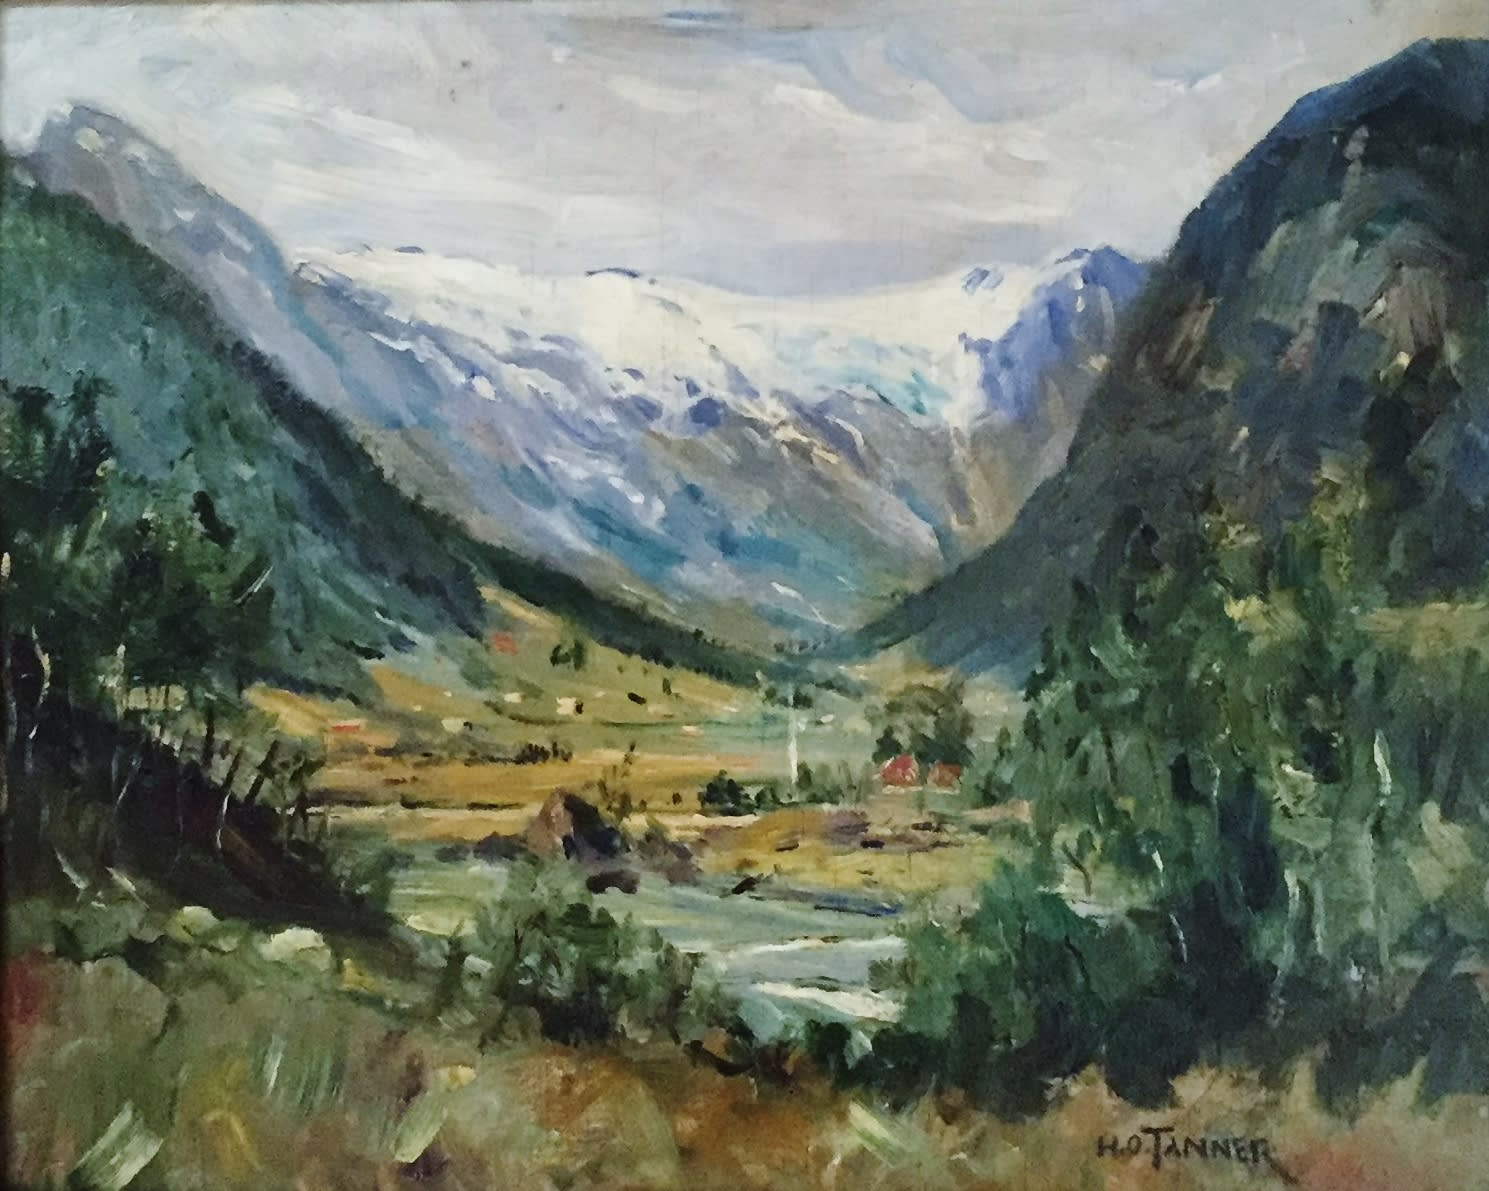 Henry Ossawa Tanner, Untitled (Landscape), c. 1910